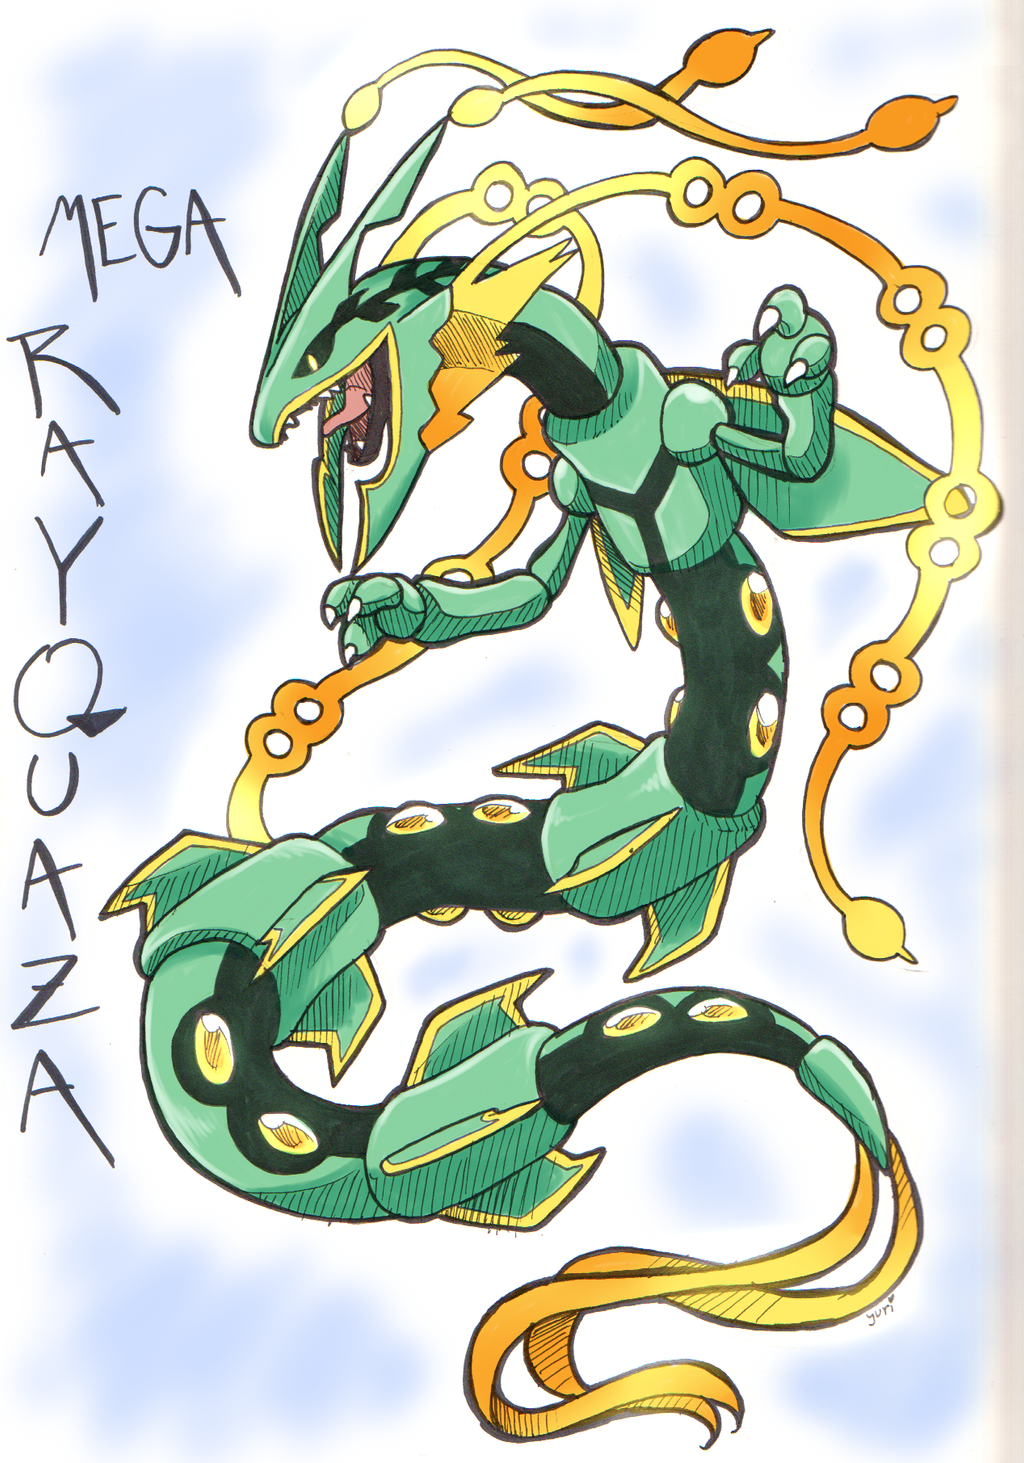 Mega Rayquaza By FENNEKlNS On DeviantArt